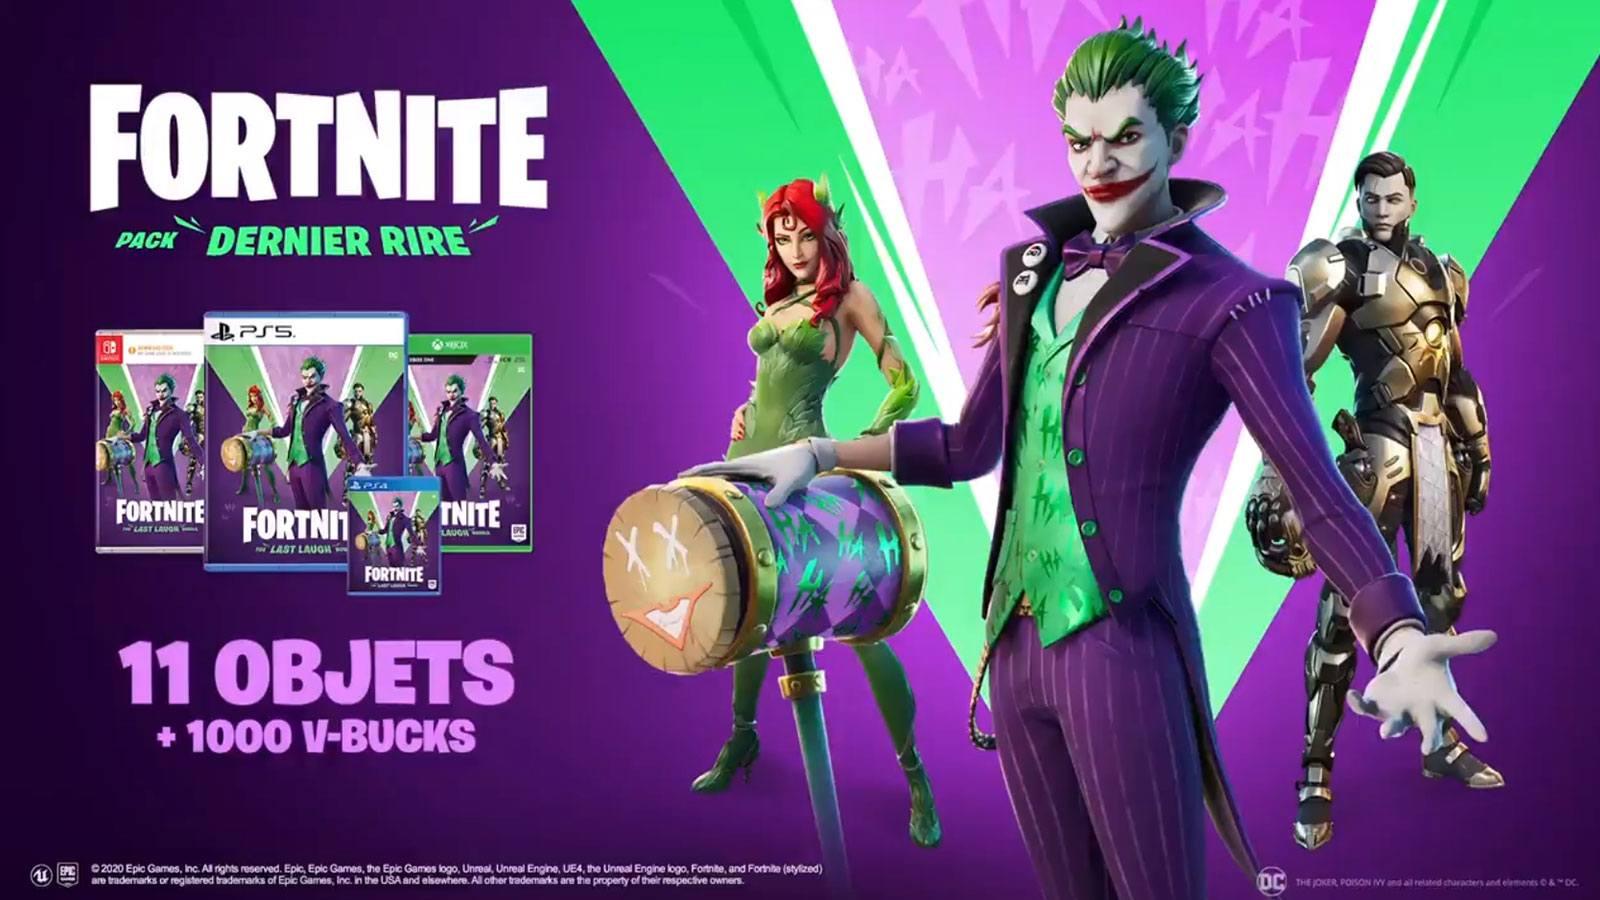 Fortnite Epic Games pack Dernier Rire DC Comics